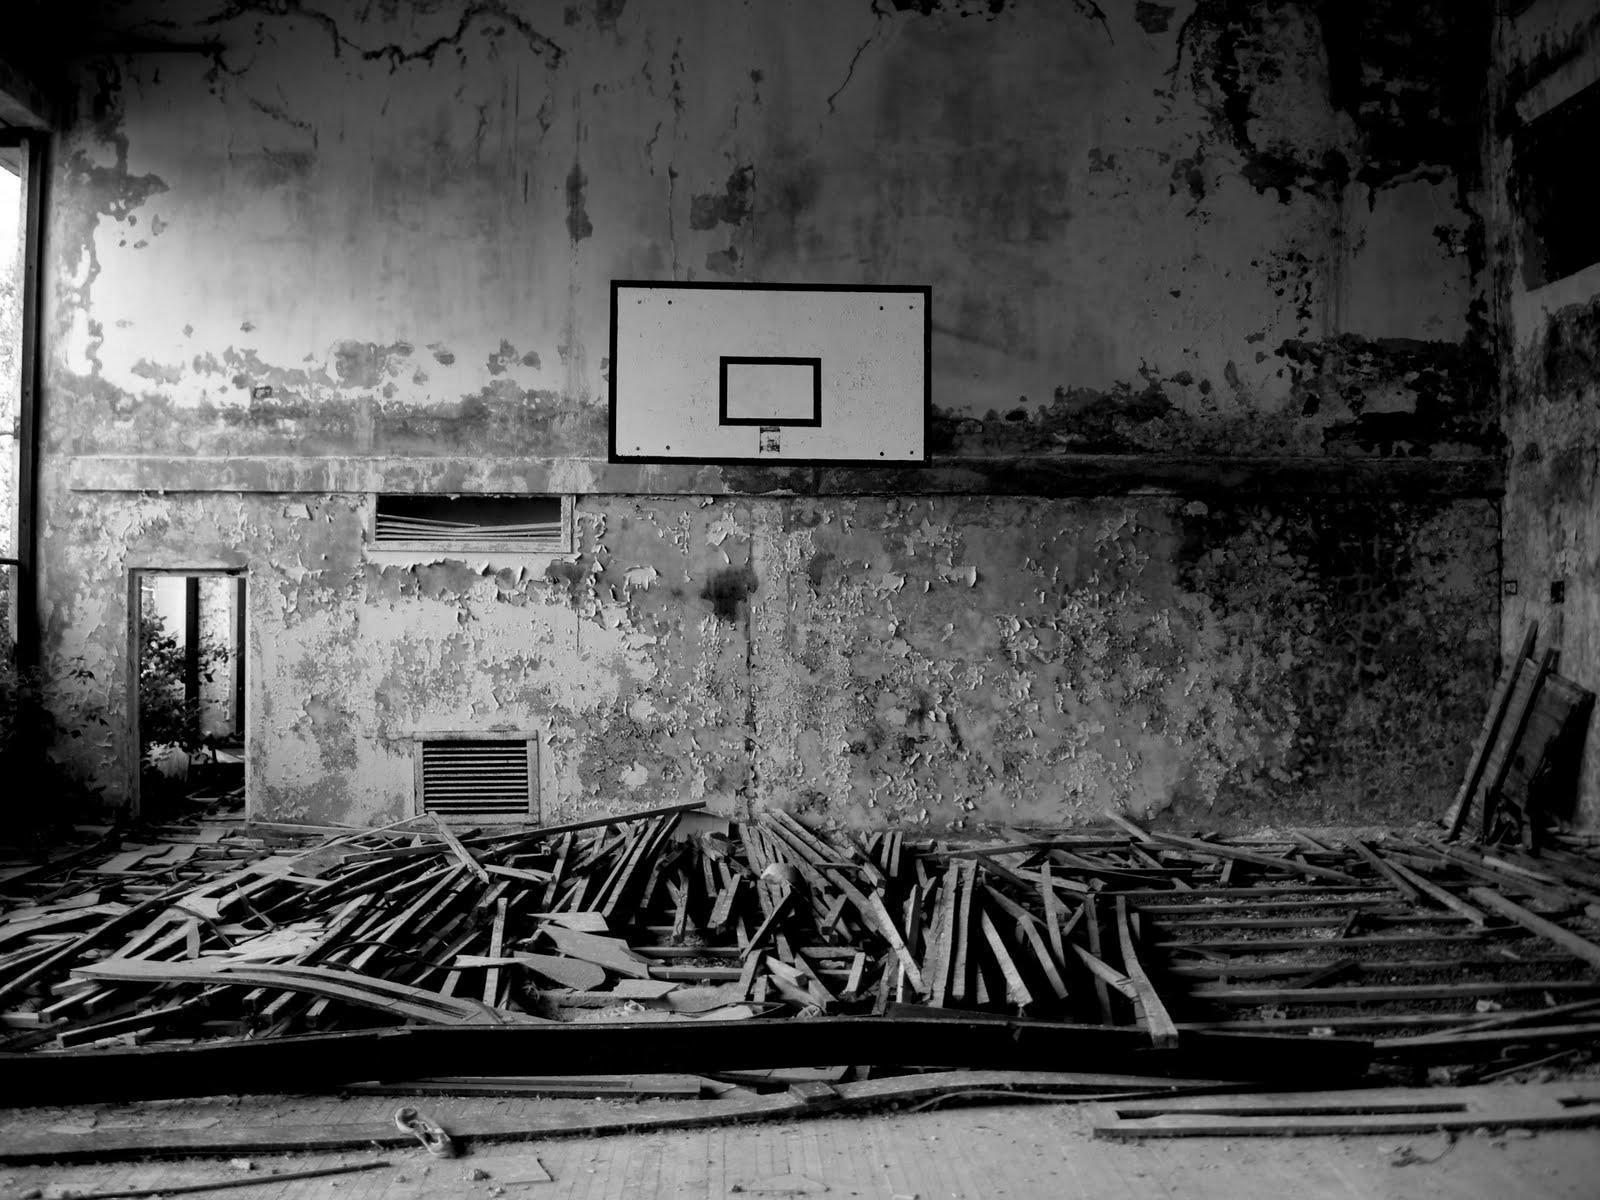 HD Wallpapers Basketball - Wallpaper Cave